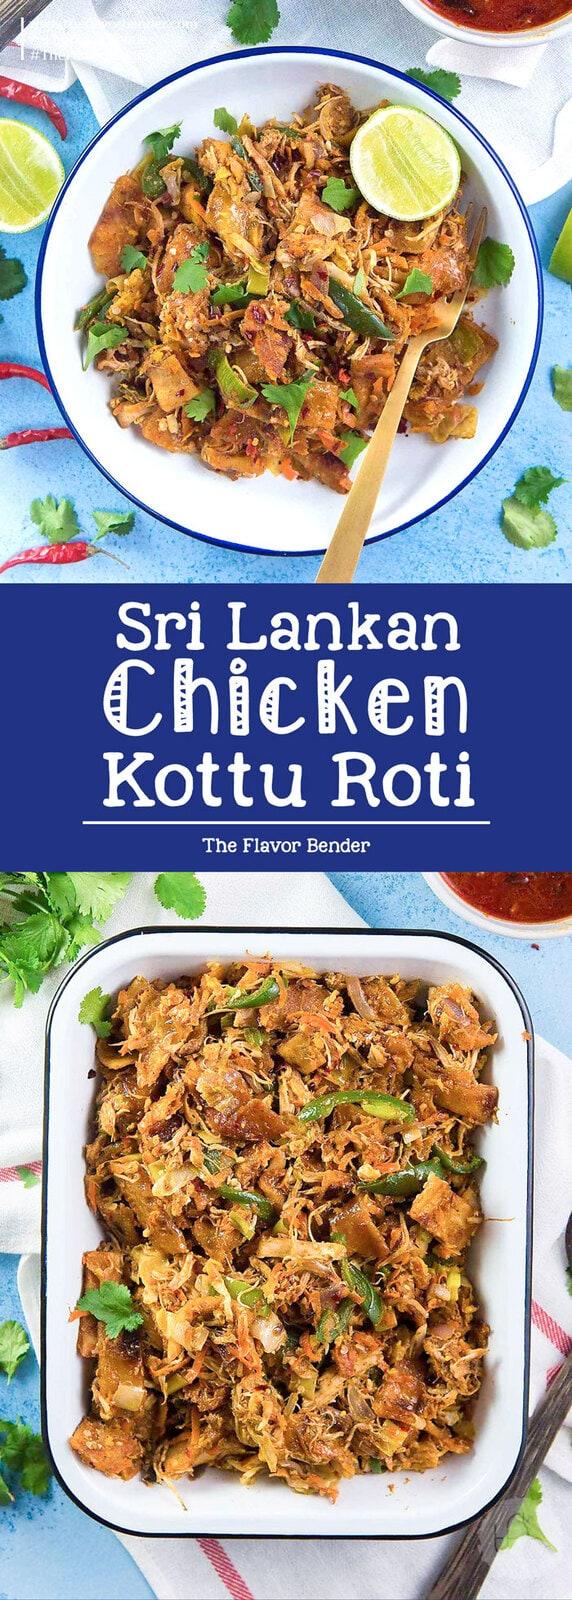 Sri lankan chicken kottu roti famous sri lankan street food the sri lankan chicken kottu roti stir fried chopped flatbread sri lankan style koththu roti forumfinder Image collections